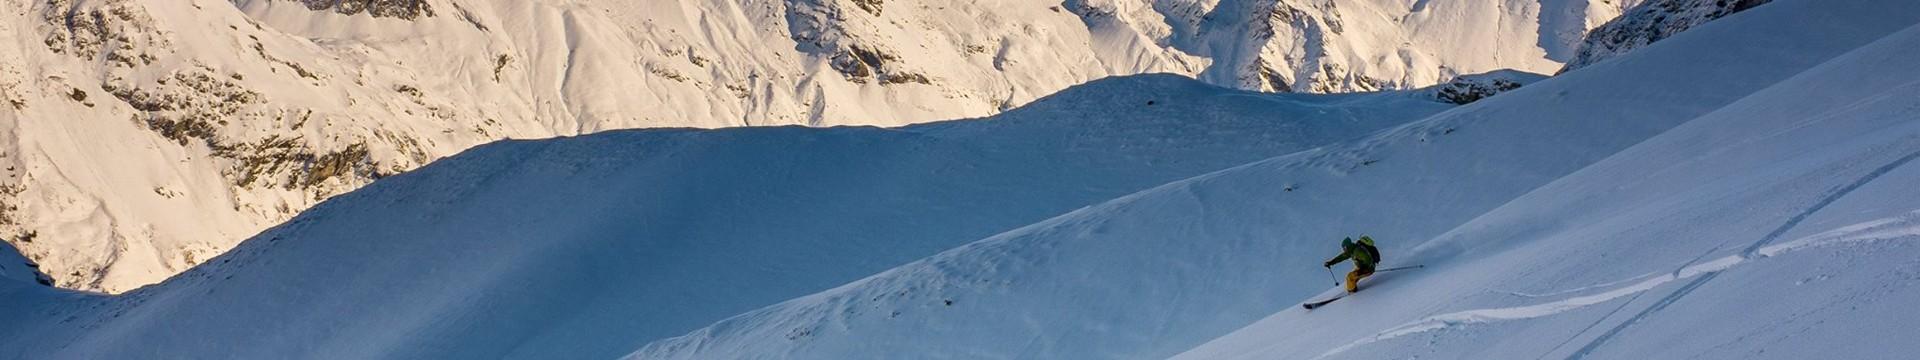 ski-08-8779